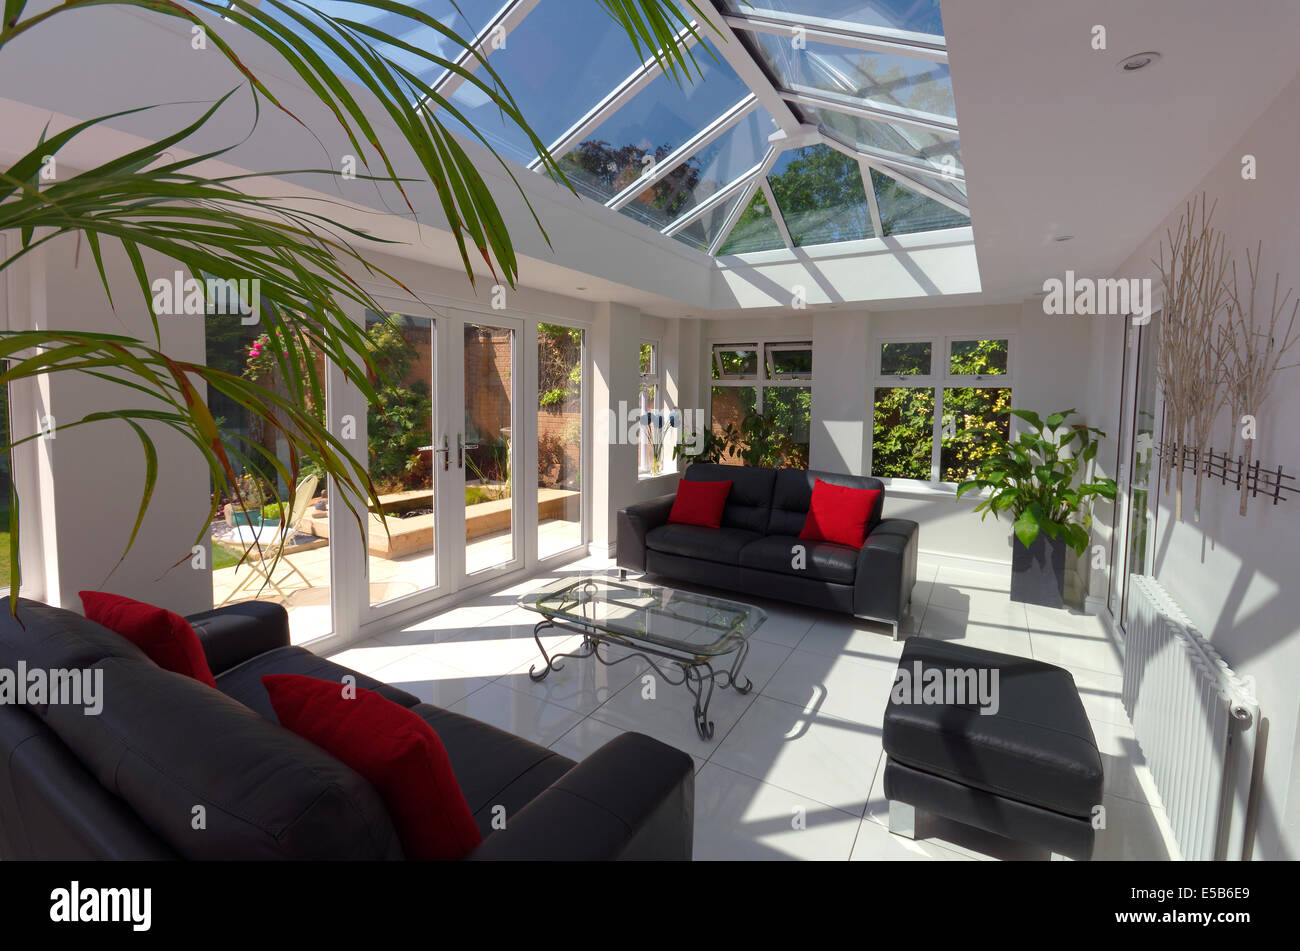 Orangery style conservatory interior home improvement Stock Photo